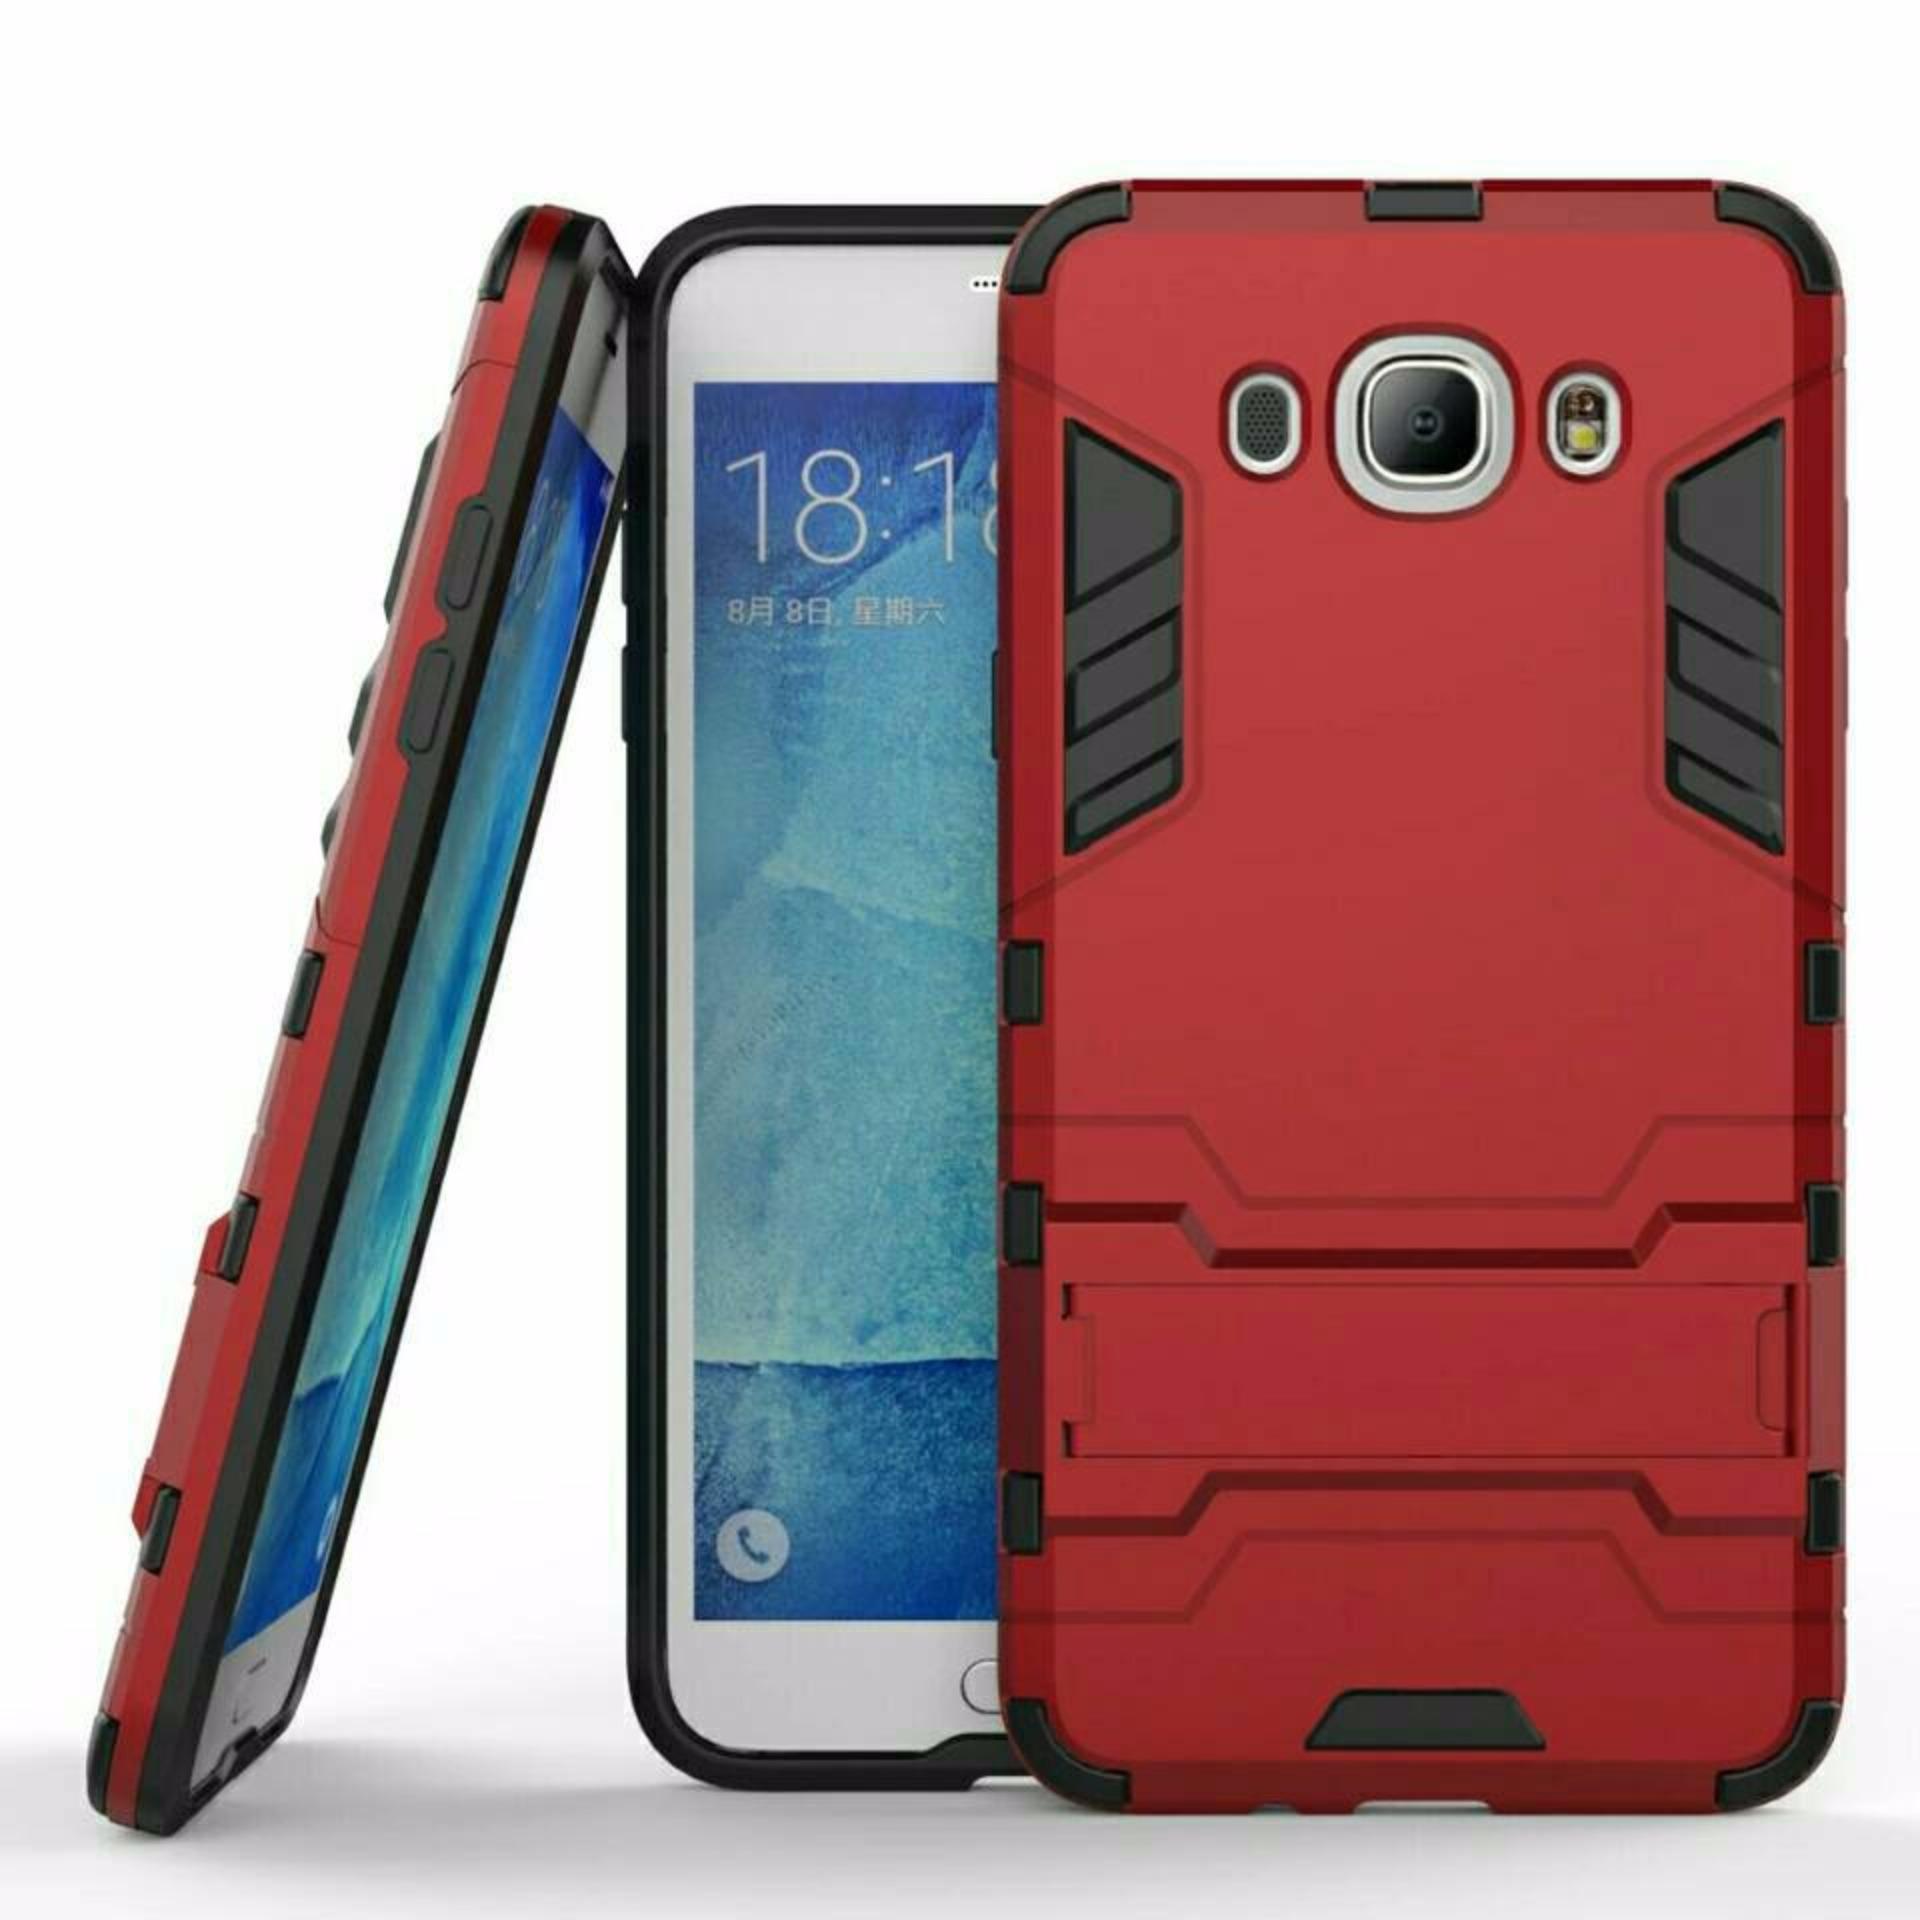 ... Case Samsung Galaxy J5 2016 Transformer Robot Casing Iron Man ...